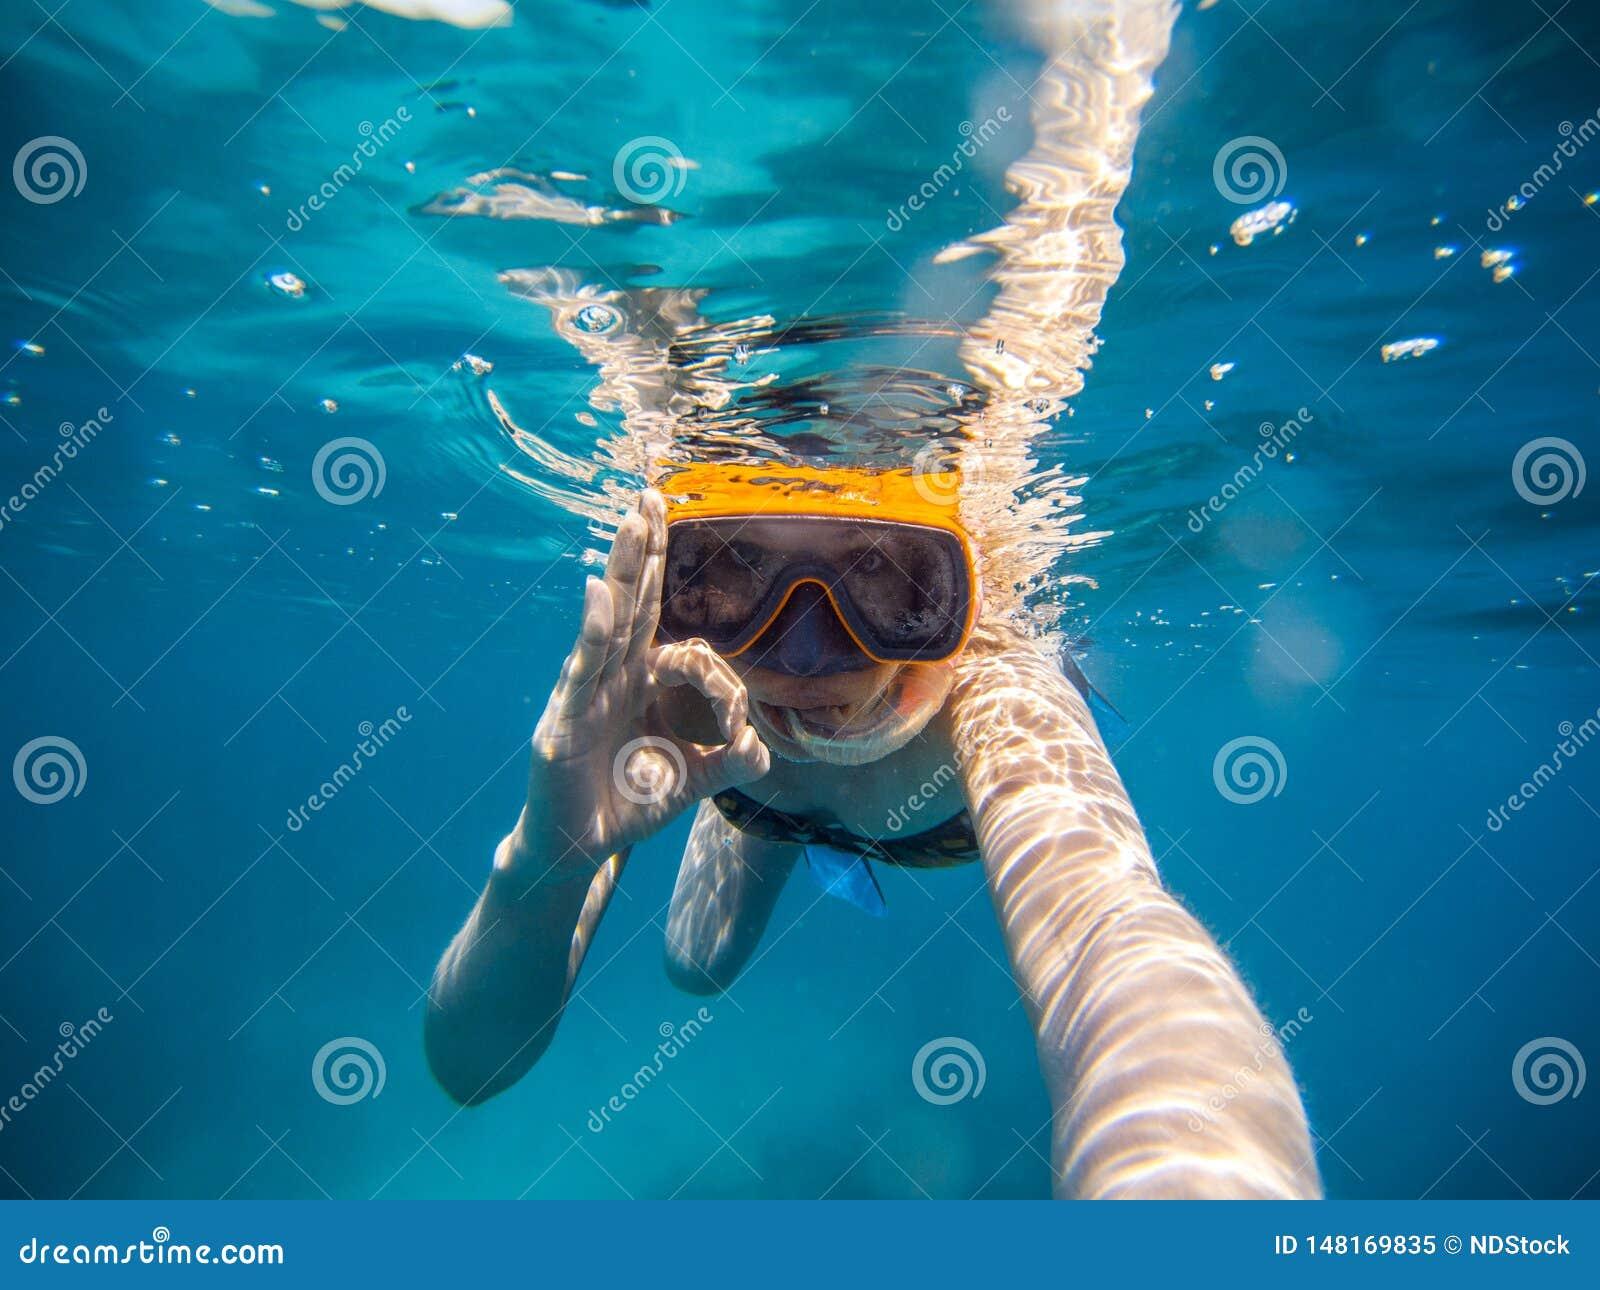 Selfie της νέας κολύμβησης με αναπνευστήρα γυναικών στη θάλασσα Κάνοντας όλα το εντάξει σύμβολο